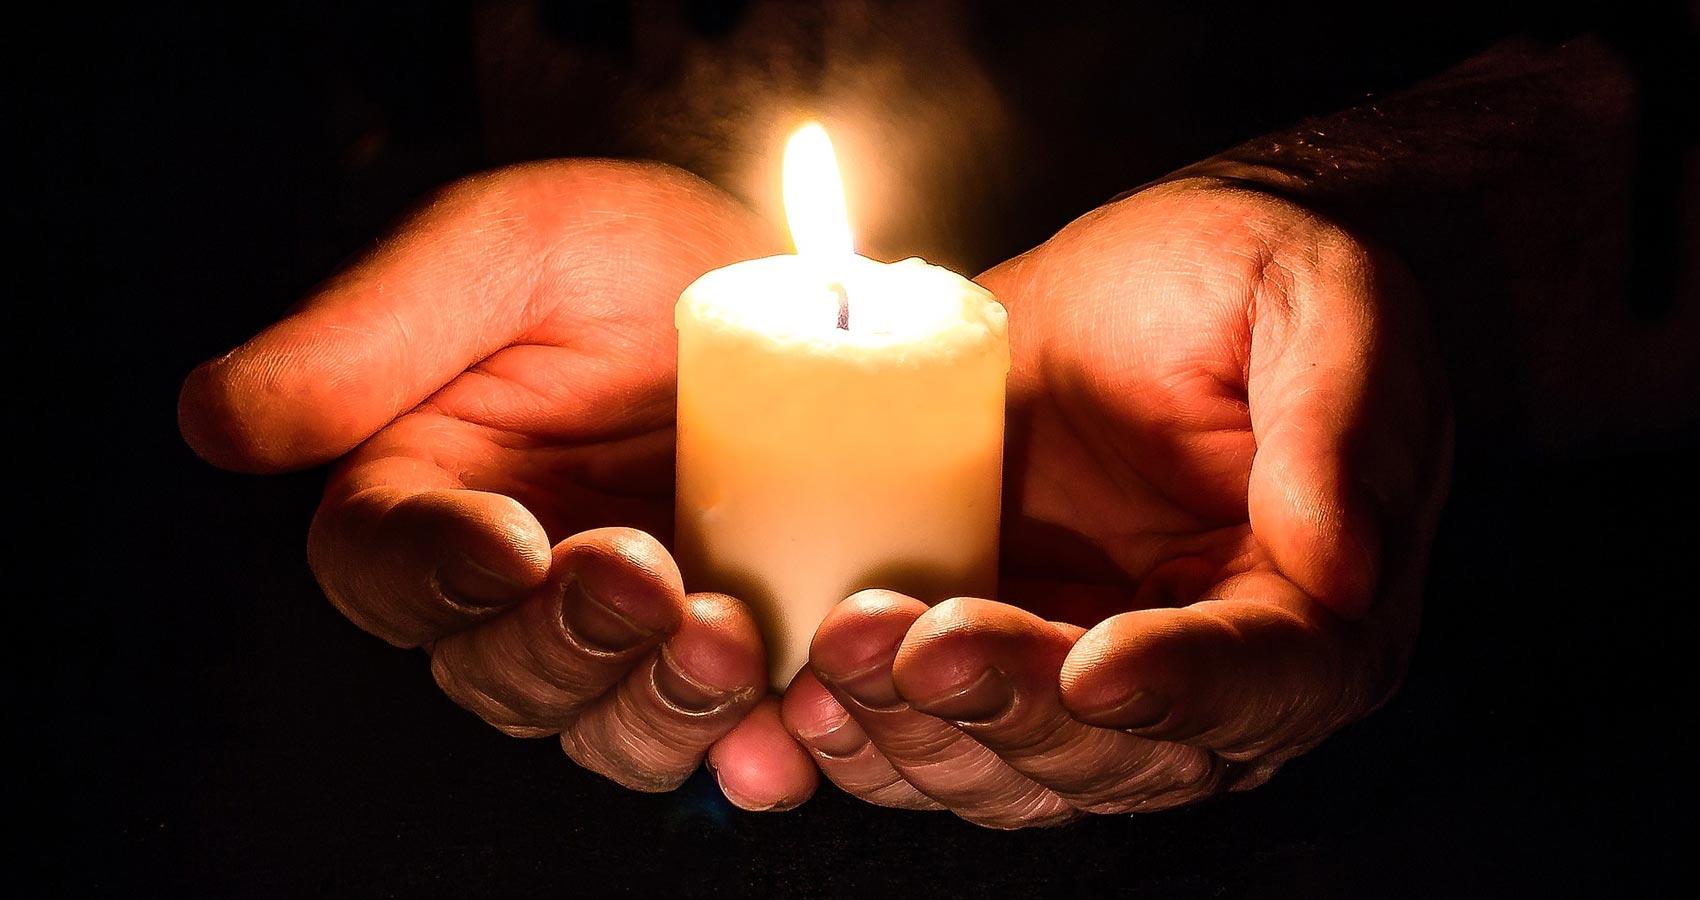 I Lit Candles Awaiting Your Return, poetry by Richard O. Ogunmodede at Spillwords.com